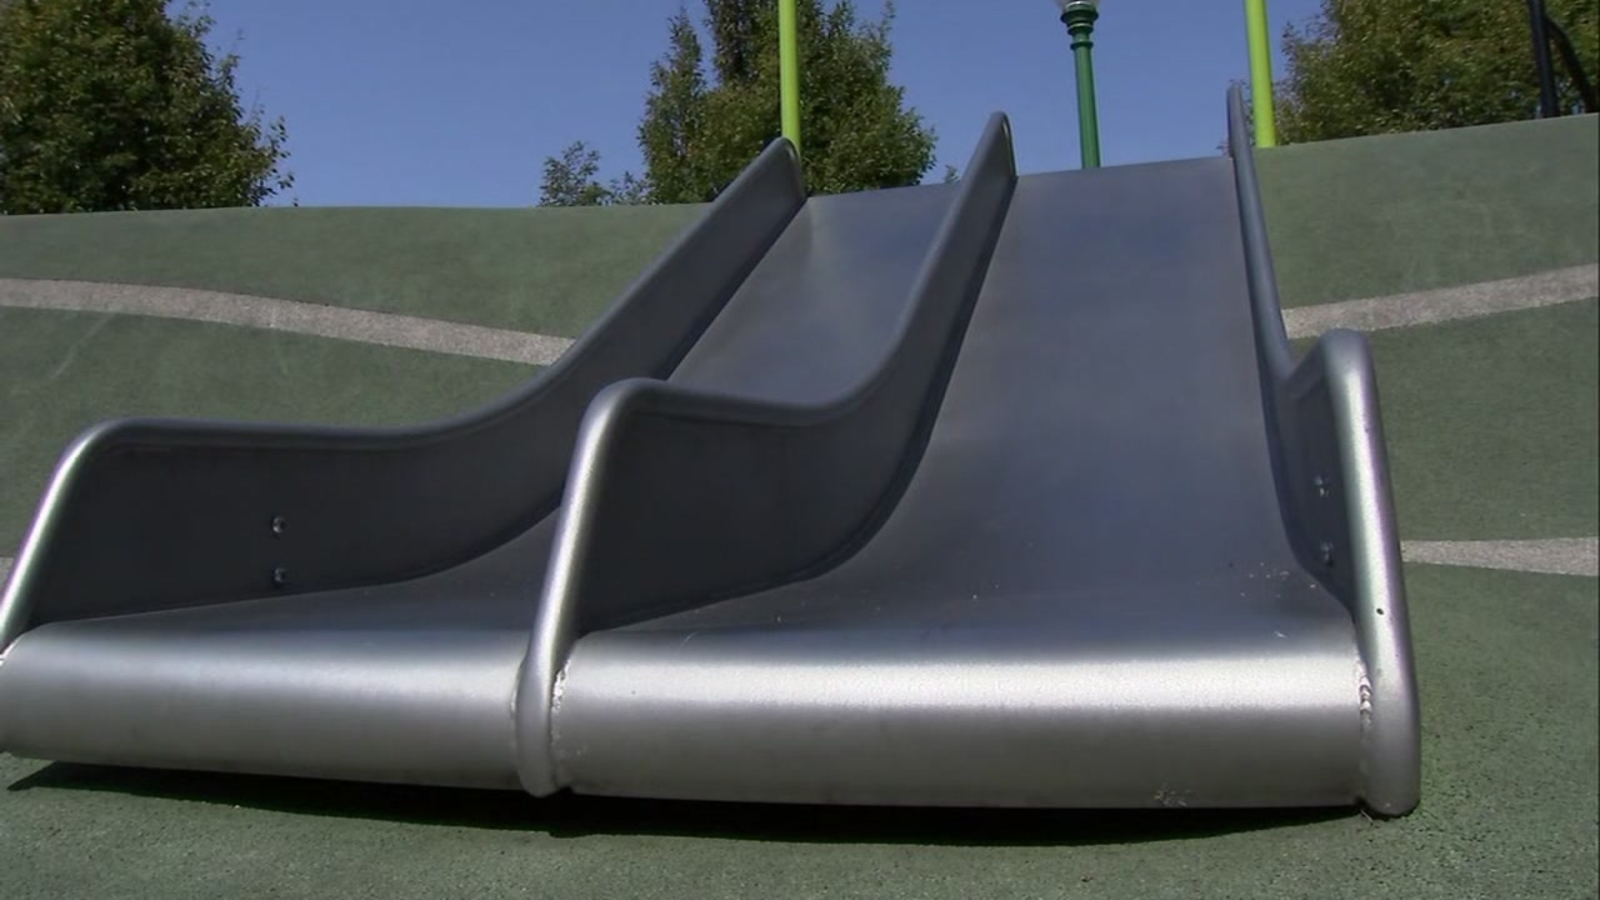 6676368 093020 kgo sf playground slide img Image 16 47 59,22 jpg?w=1600.'